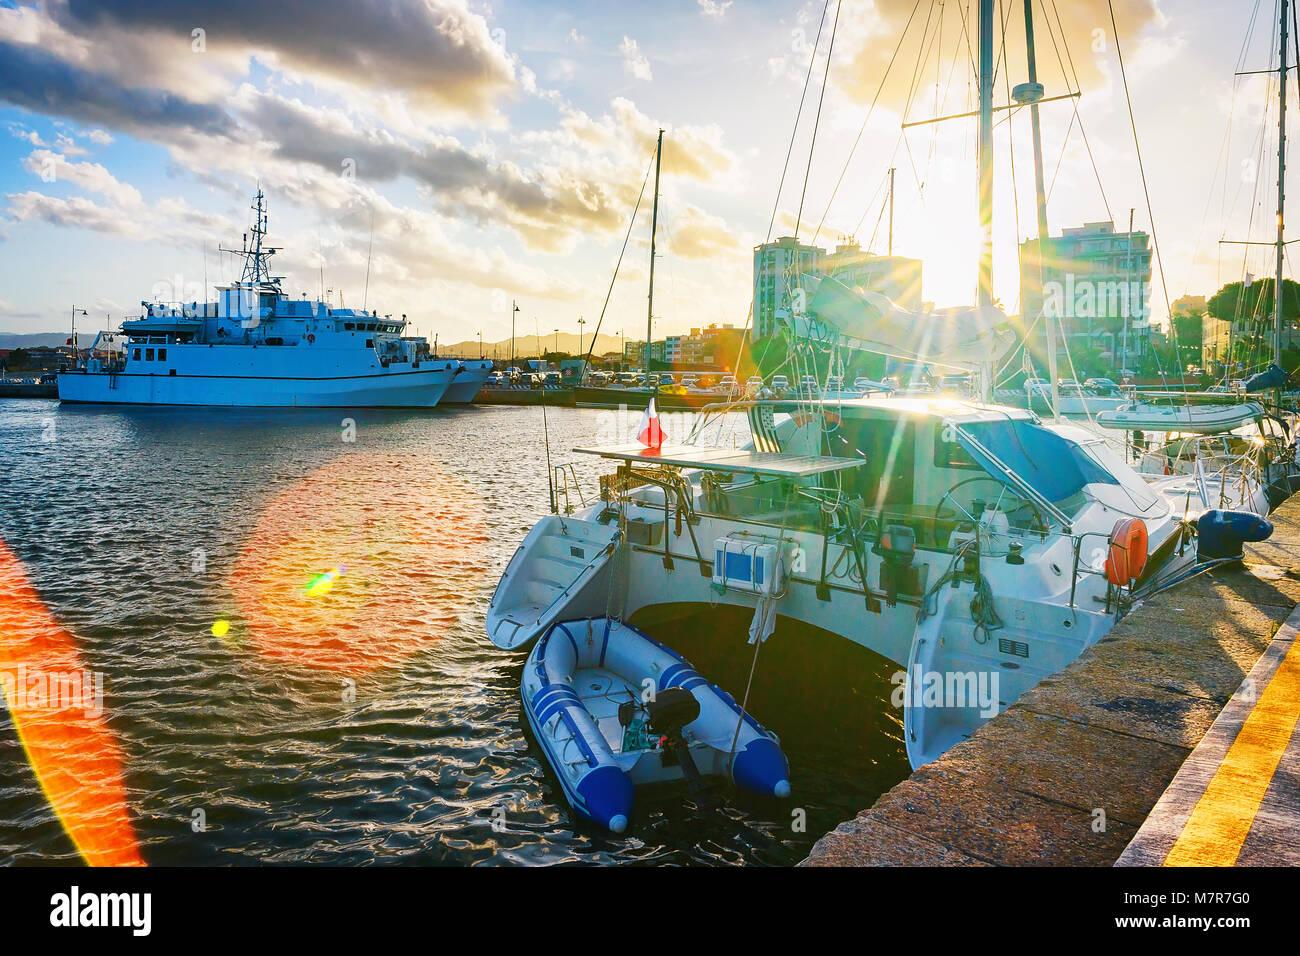 Sunset at Harbor with Luxury ships in Olbia, Sardinia, Italy - Stock Image